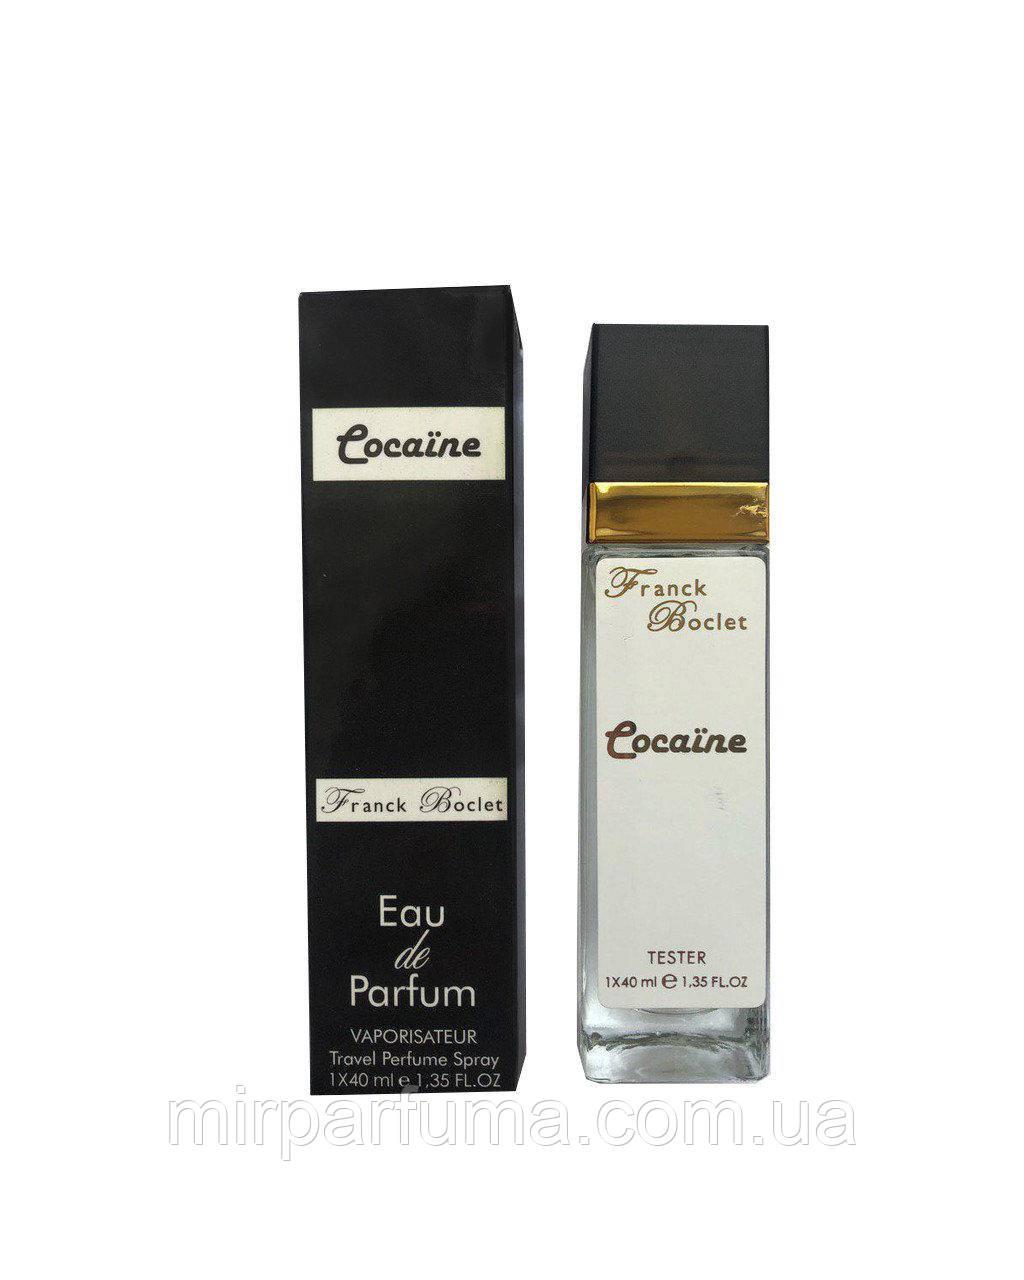 Женские духи тестер Franck Boclet Cocaїne - Travel Perfume 40ml